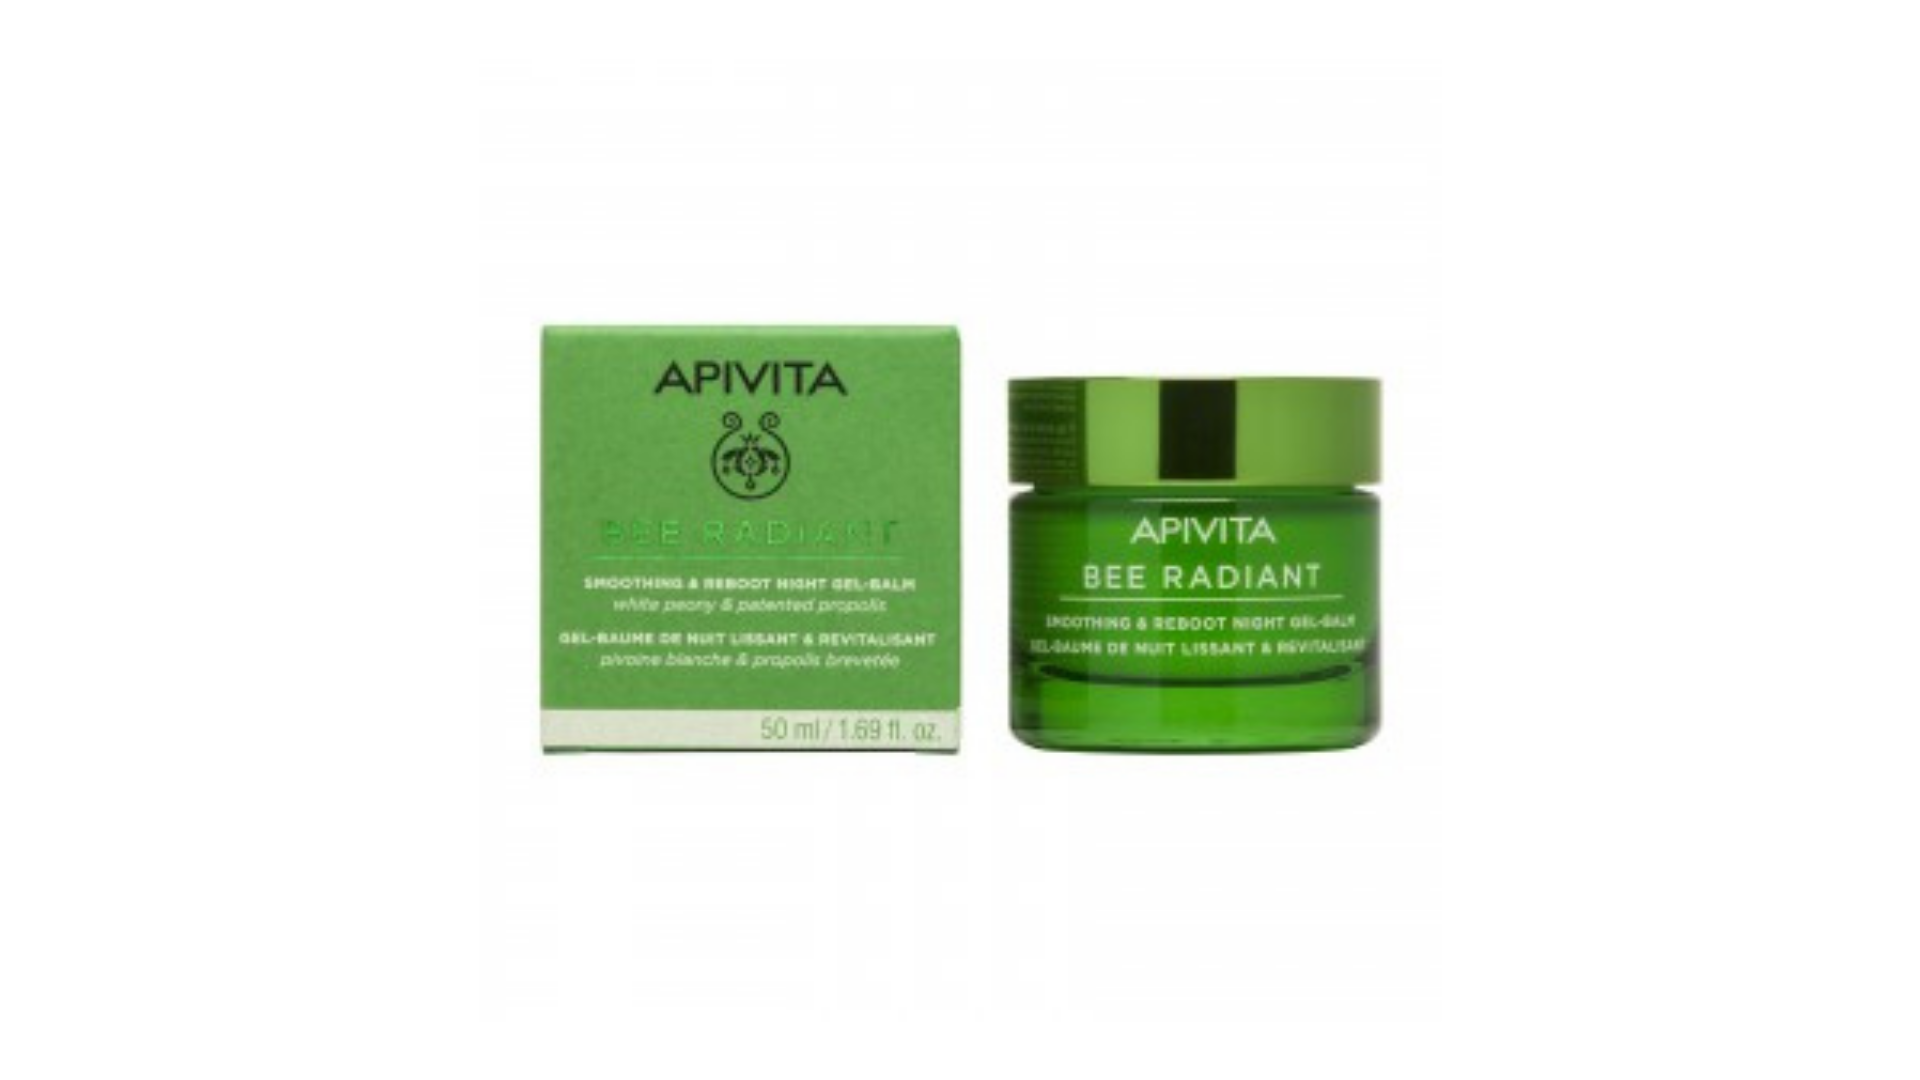 Apivita | Bee Radiant Gel-bálsamo de Noite Suavizante & Revitalizante 50ml